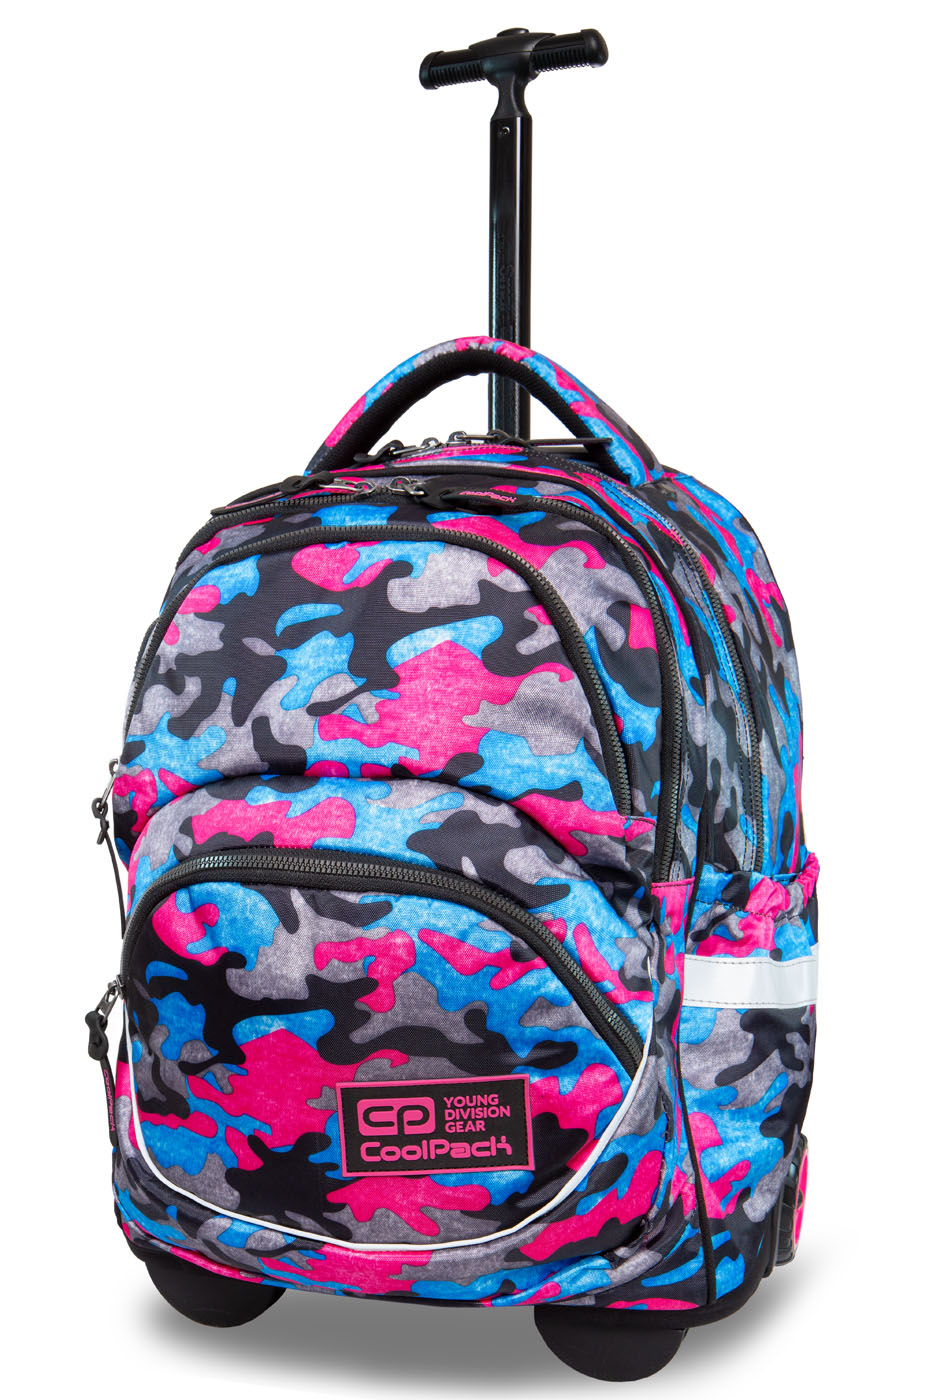 Coolpack   starr rygsæk med hjul   camo fusion pink